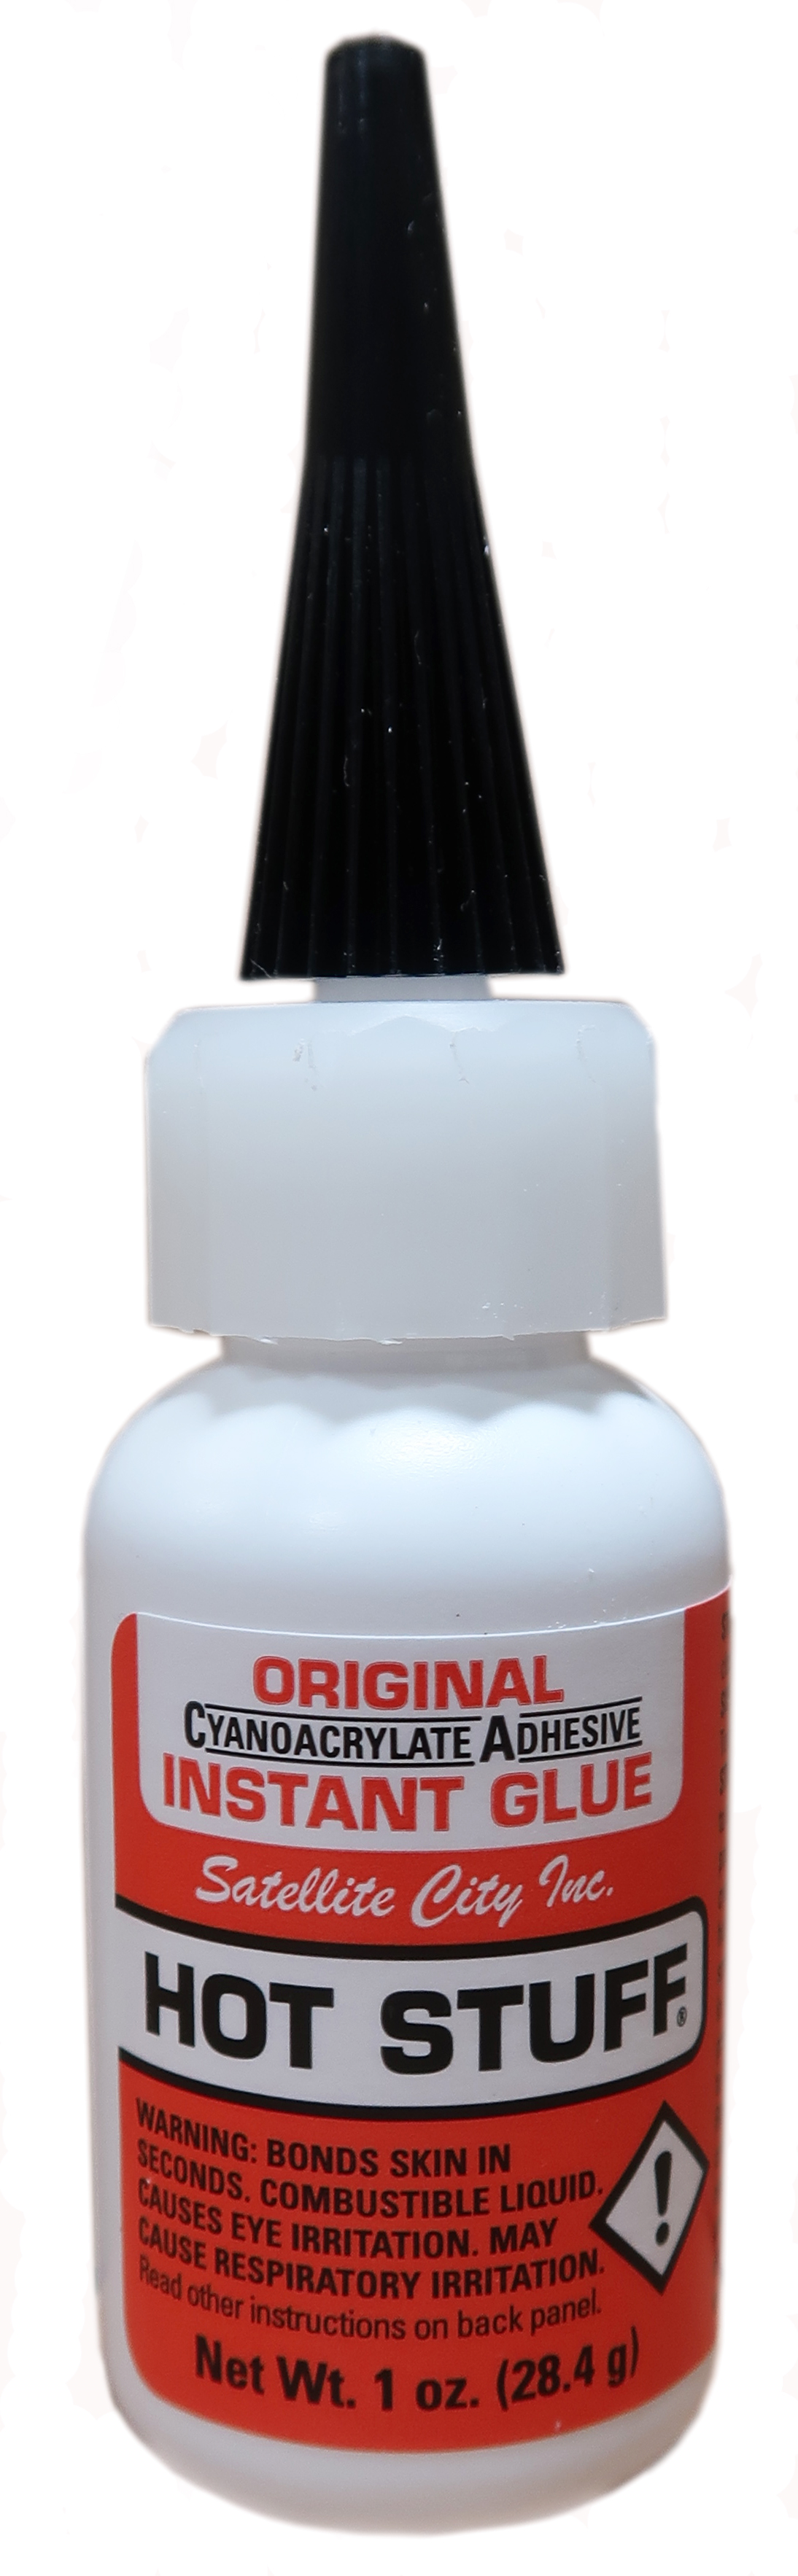 HS-7 Hot Stuff 1oz thin CA glue from Satellite City Instant Glues